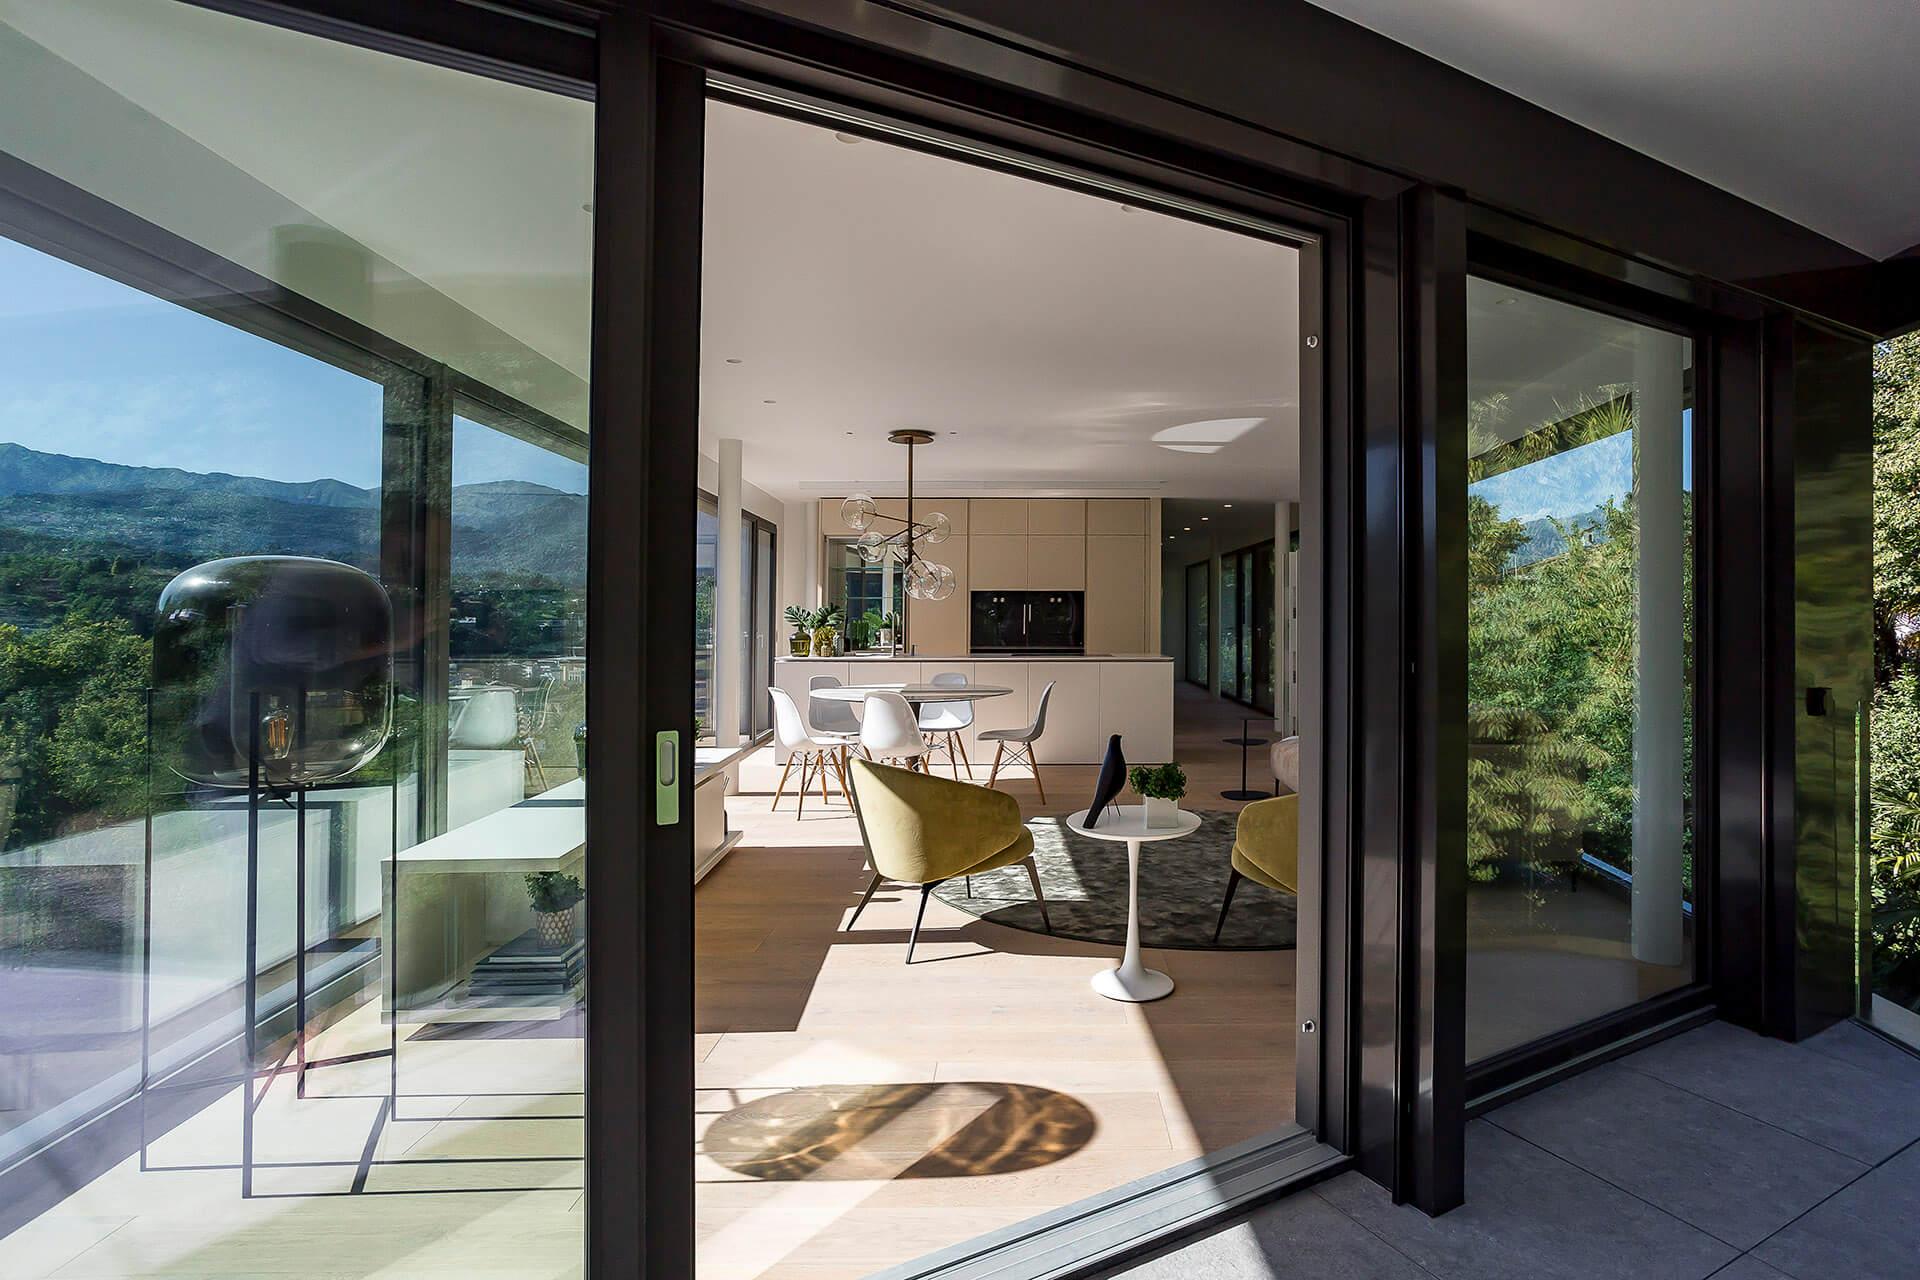 immobilien mieten oder kaufen candinas ag. Black Bedroom Furniture Sets. Home Design Ideas